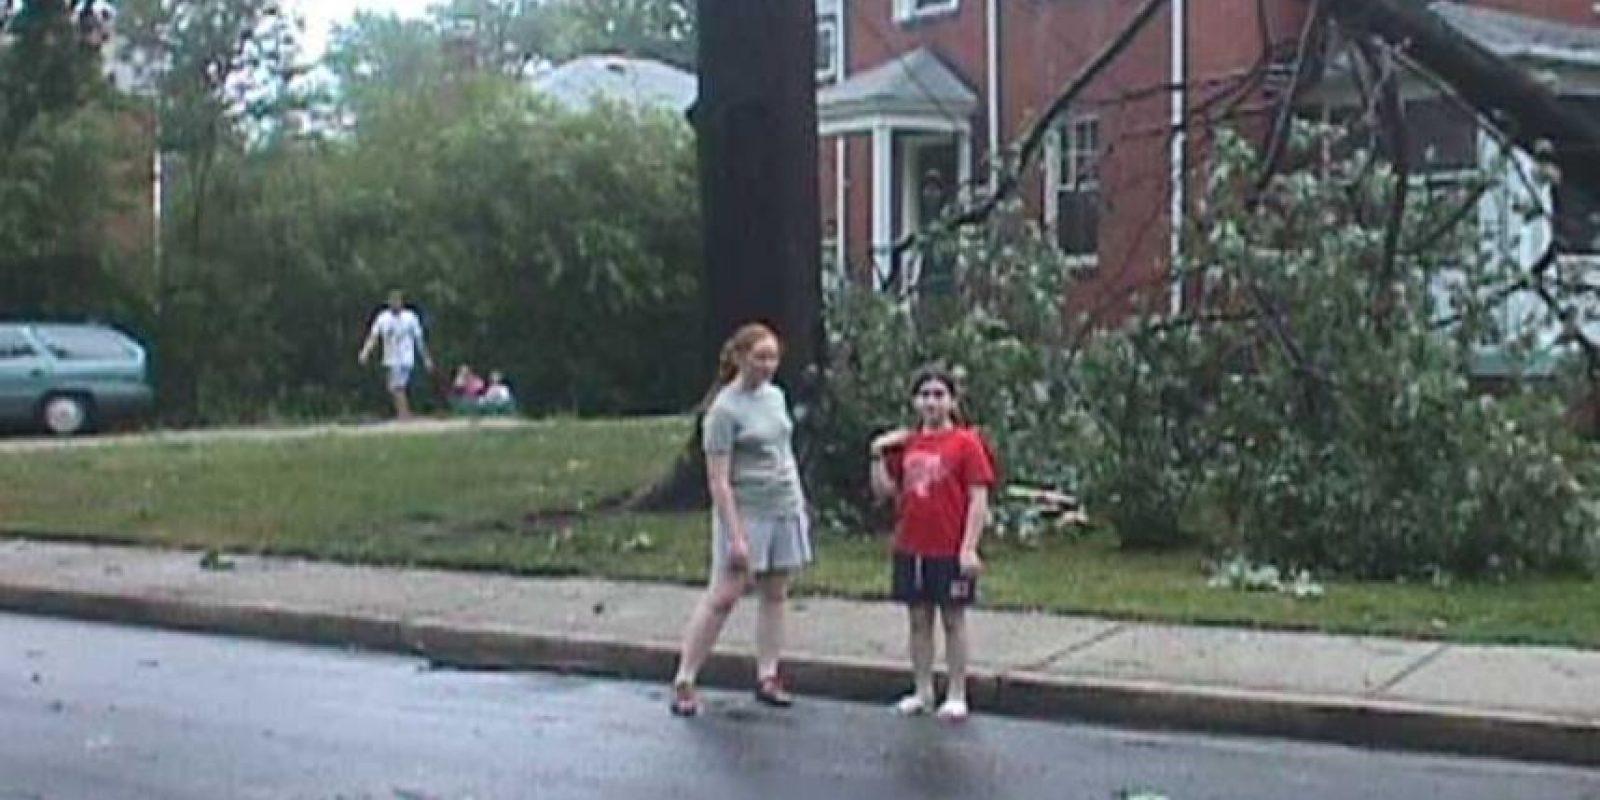 10. Fíjense en la ventana de la planta baja, justo detrás de la niña de rojo. Foto:Scaryforkids